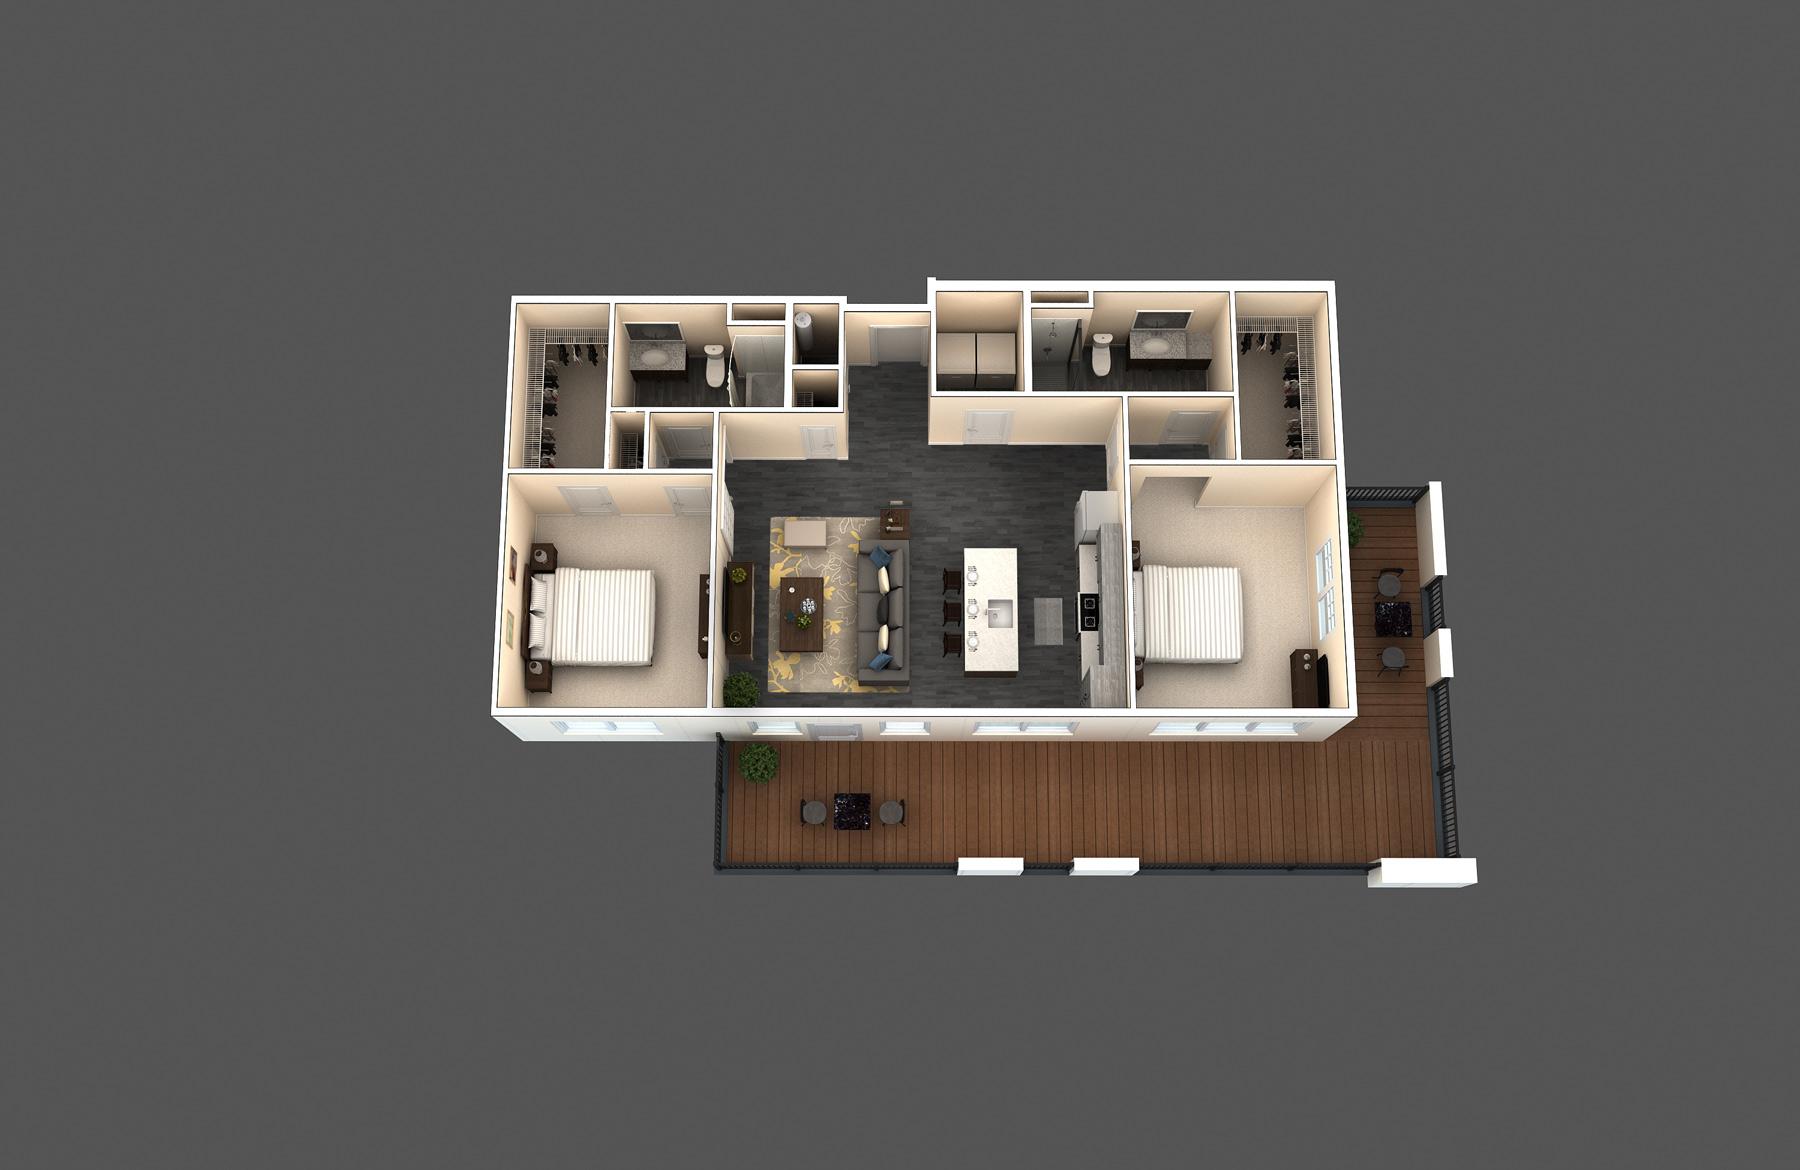 The Hubbard floor plan